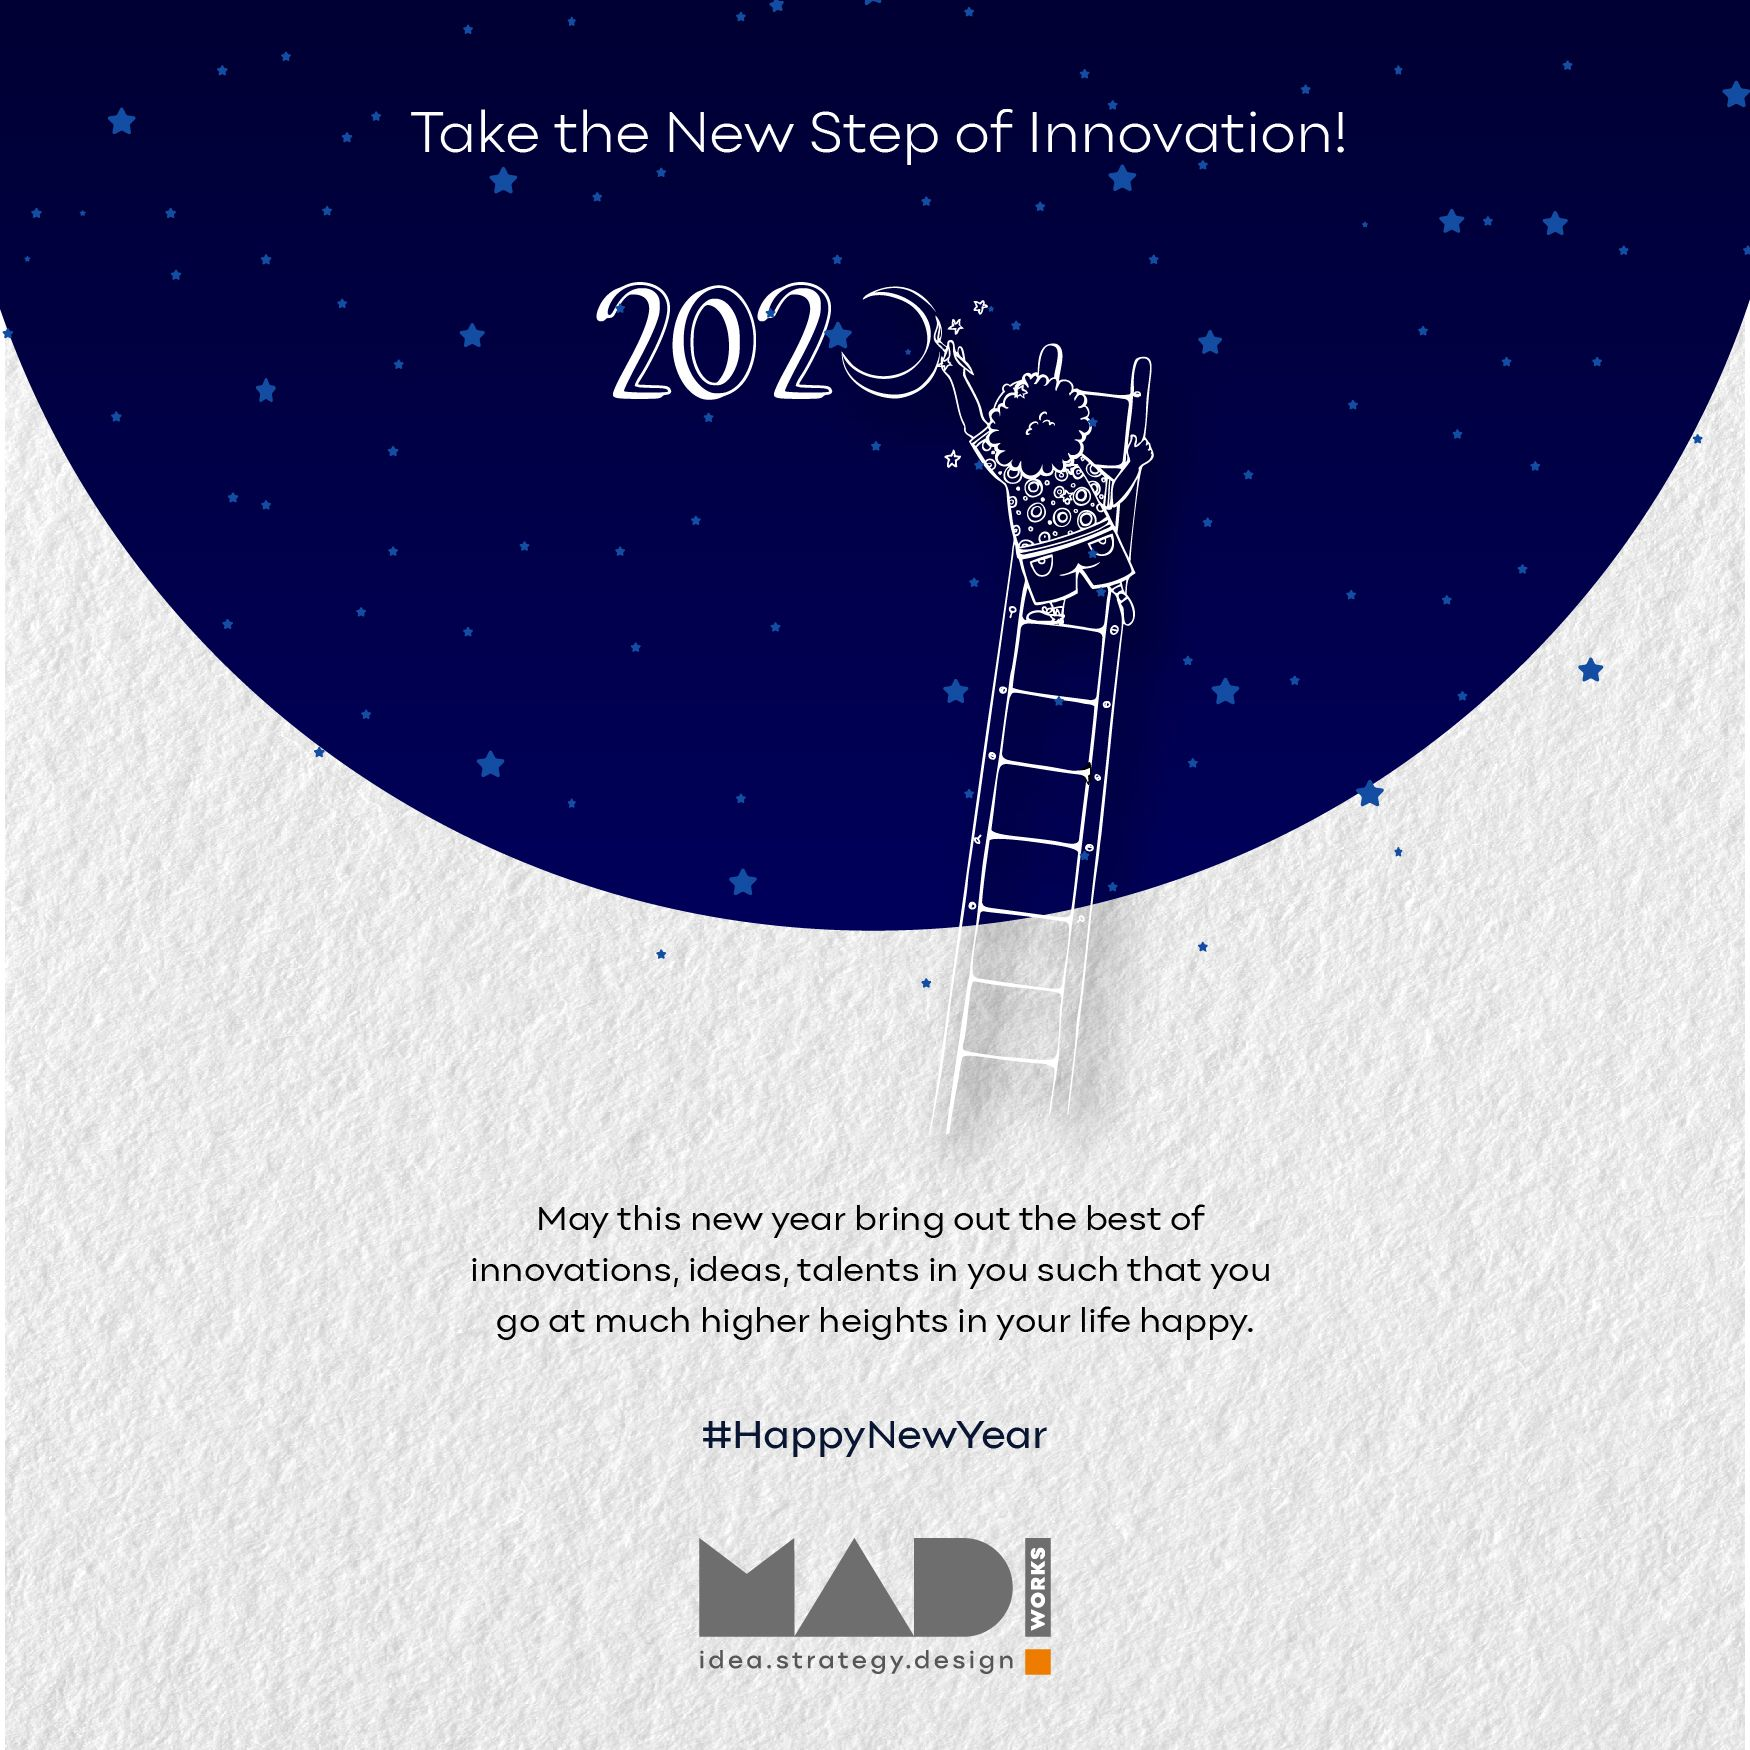 Happy New Yera 2020 in 2020 Happy new year, Directions